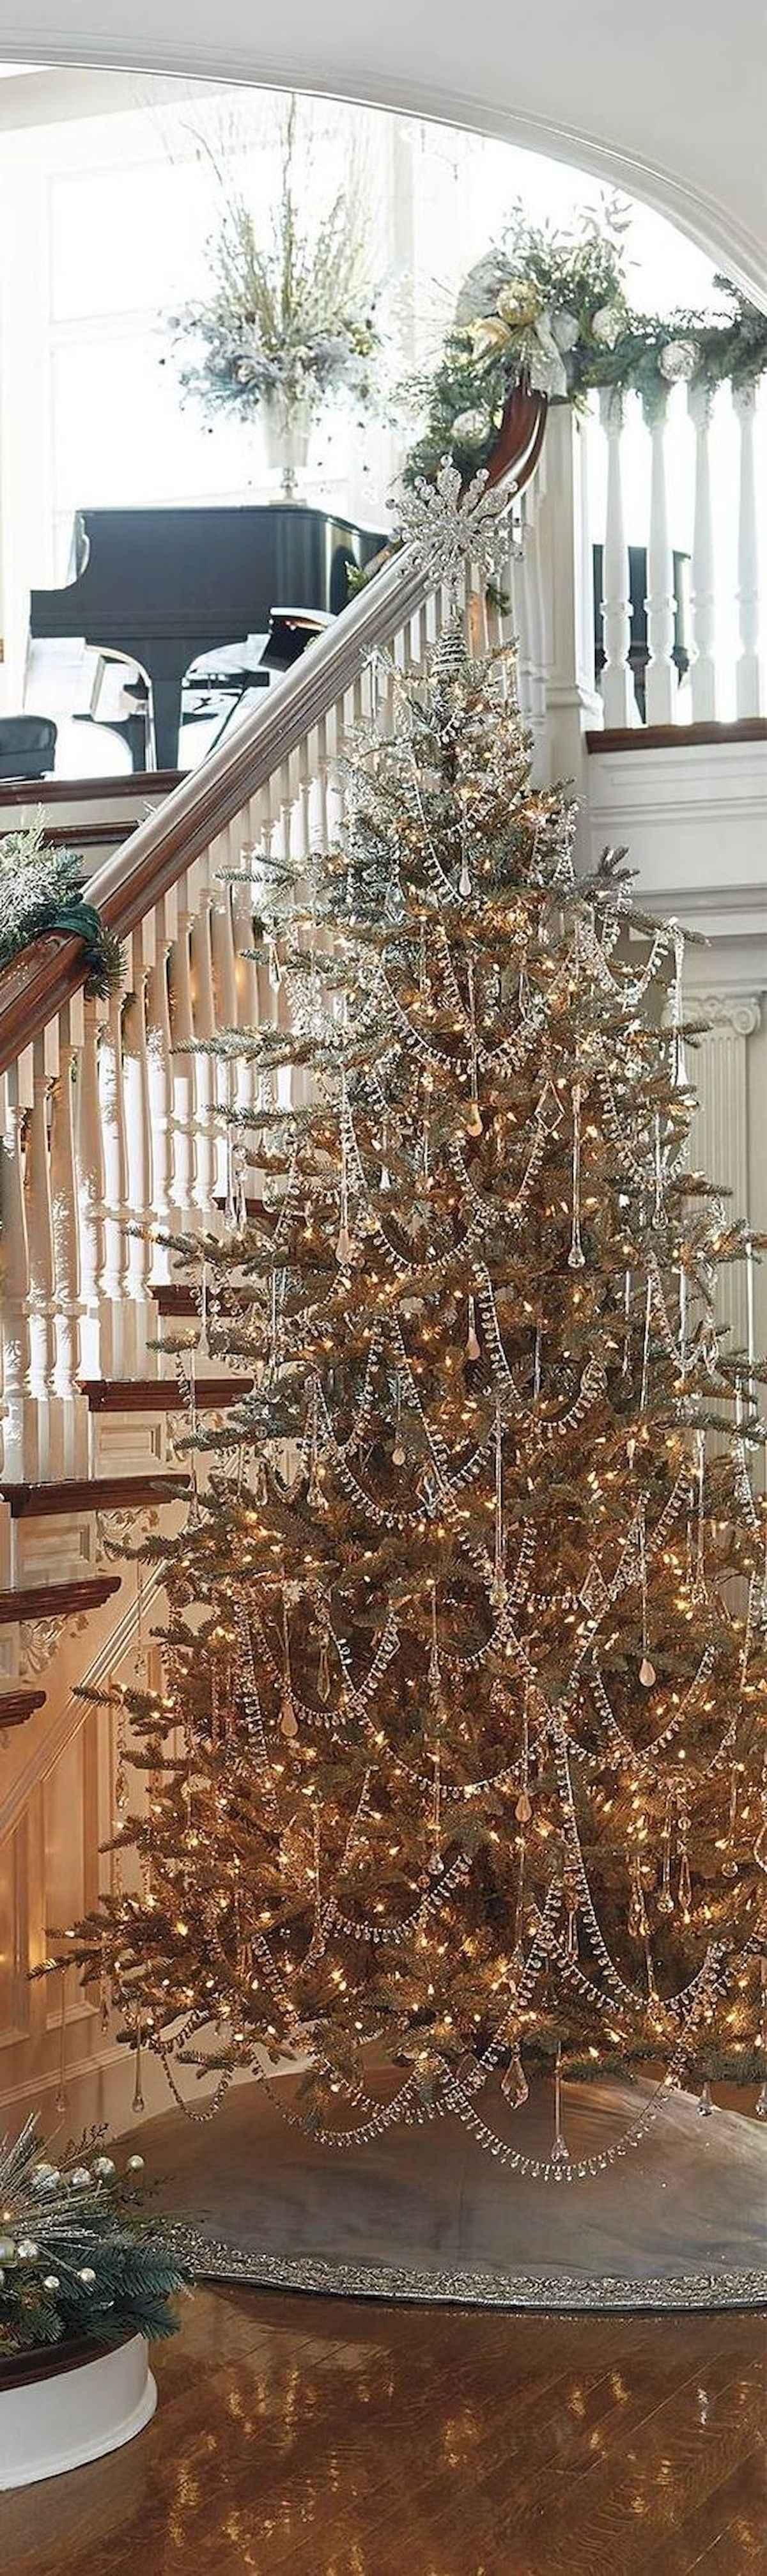 40 elegant christmas tree decorations ideas (36)